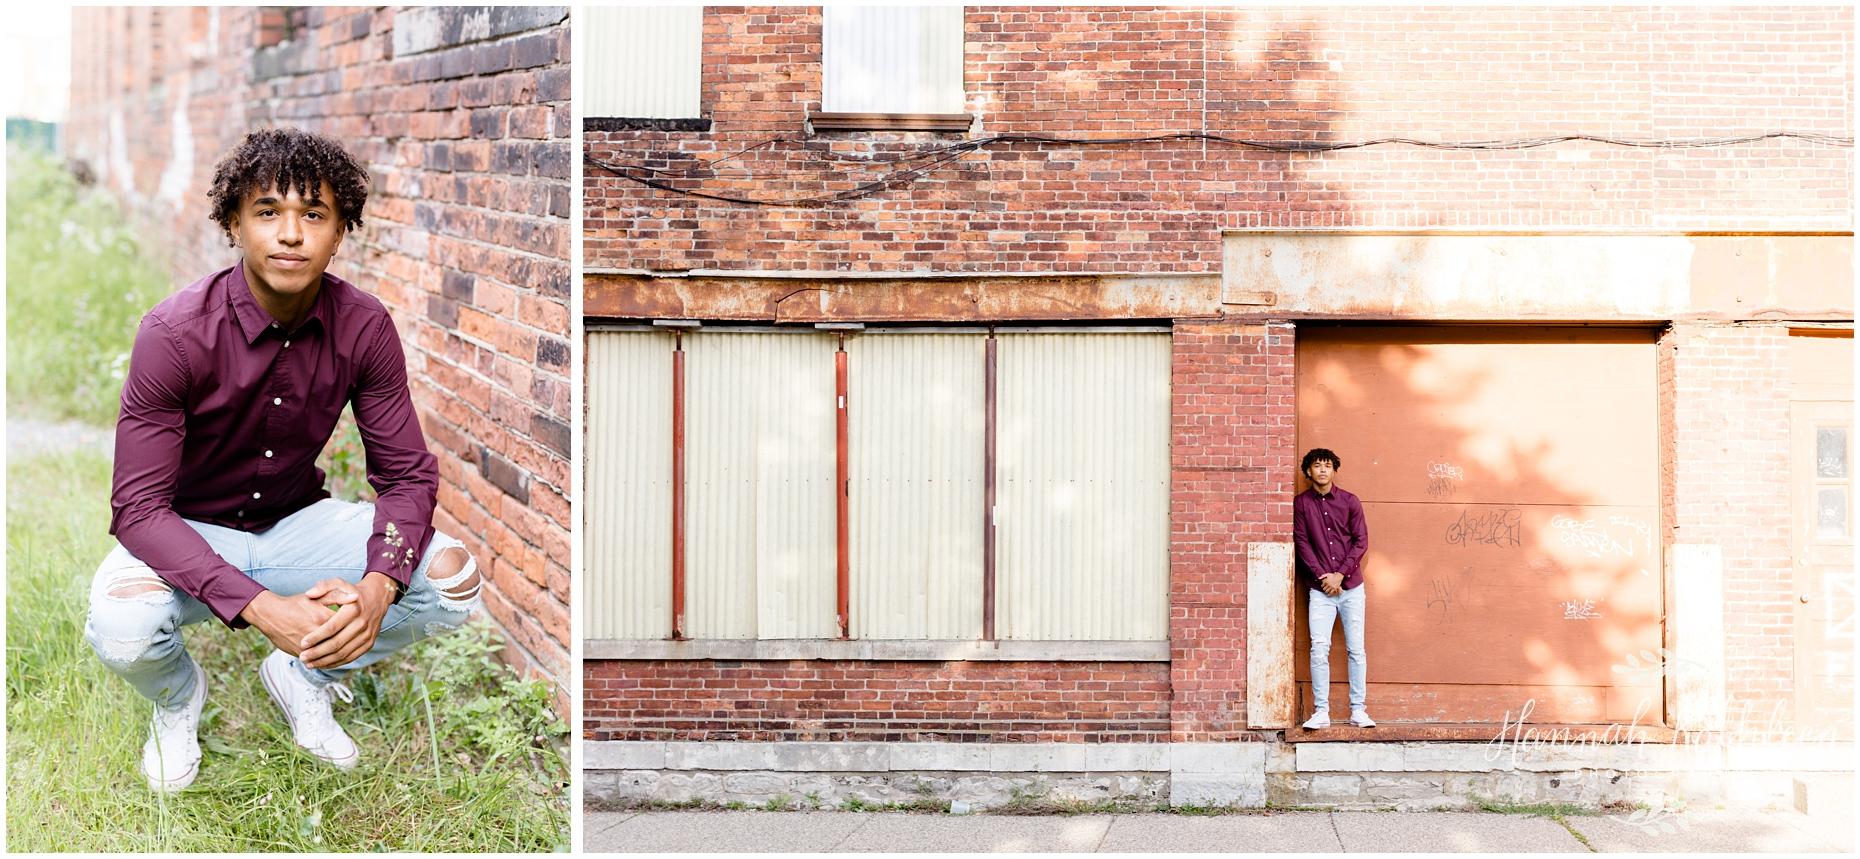 solomon_senior_photographer_downtown_buffalo_new_york_city_hall_urban_industrial_photoshoot_boy